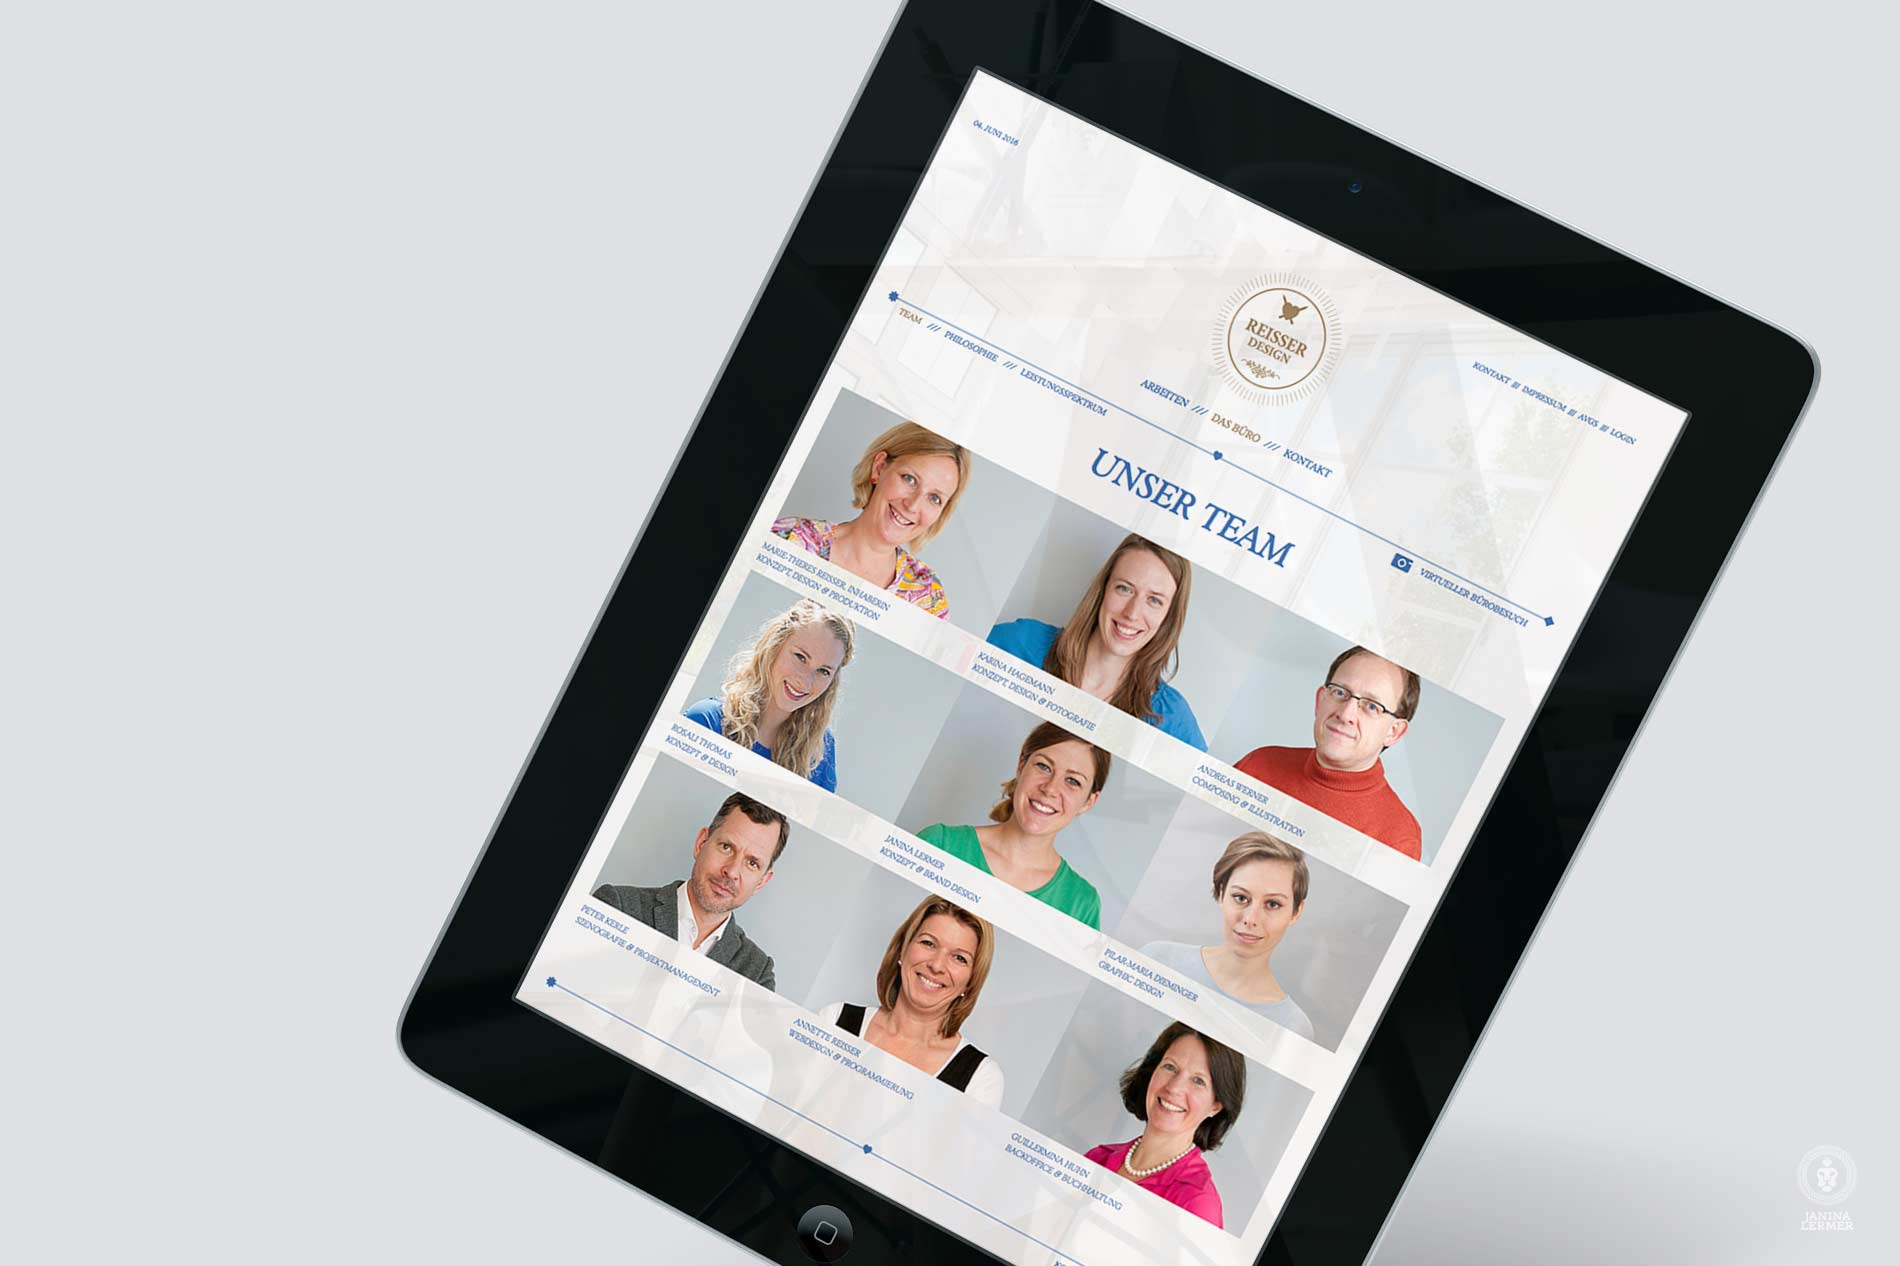 Janina-Lermer-Webseitenkonzept-Webseitengestaltung-Webdesign-Reisserdesign-Ipad-Team